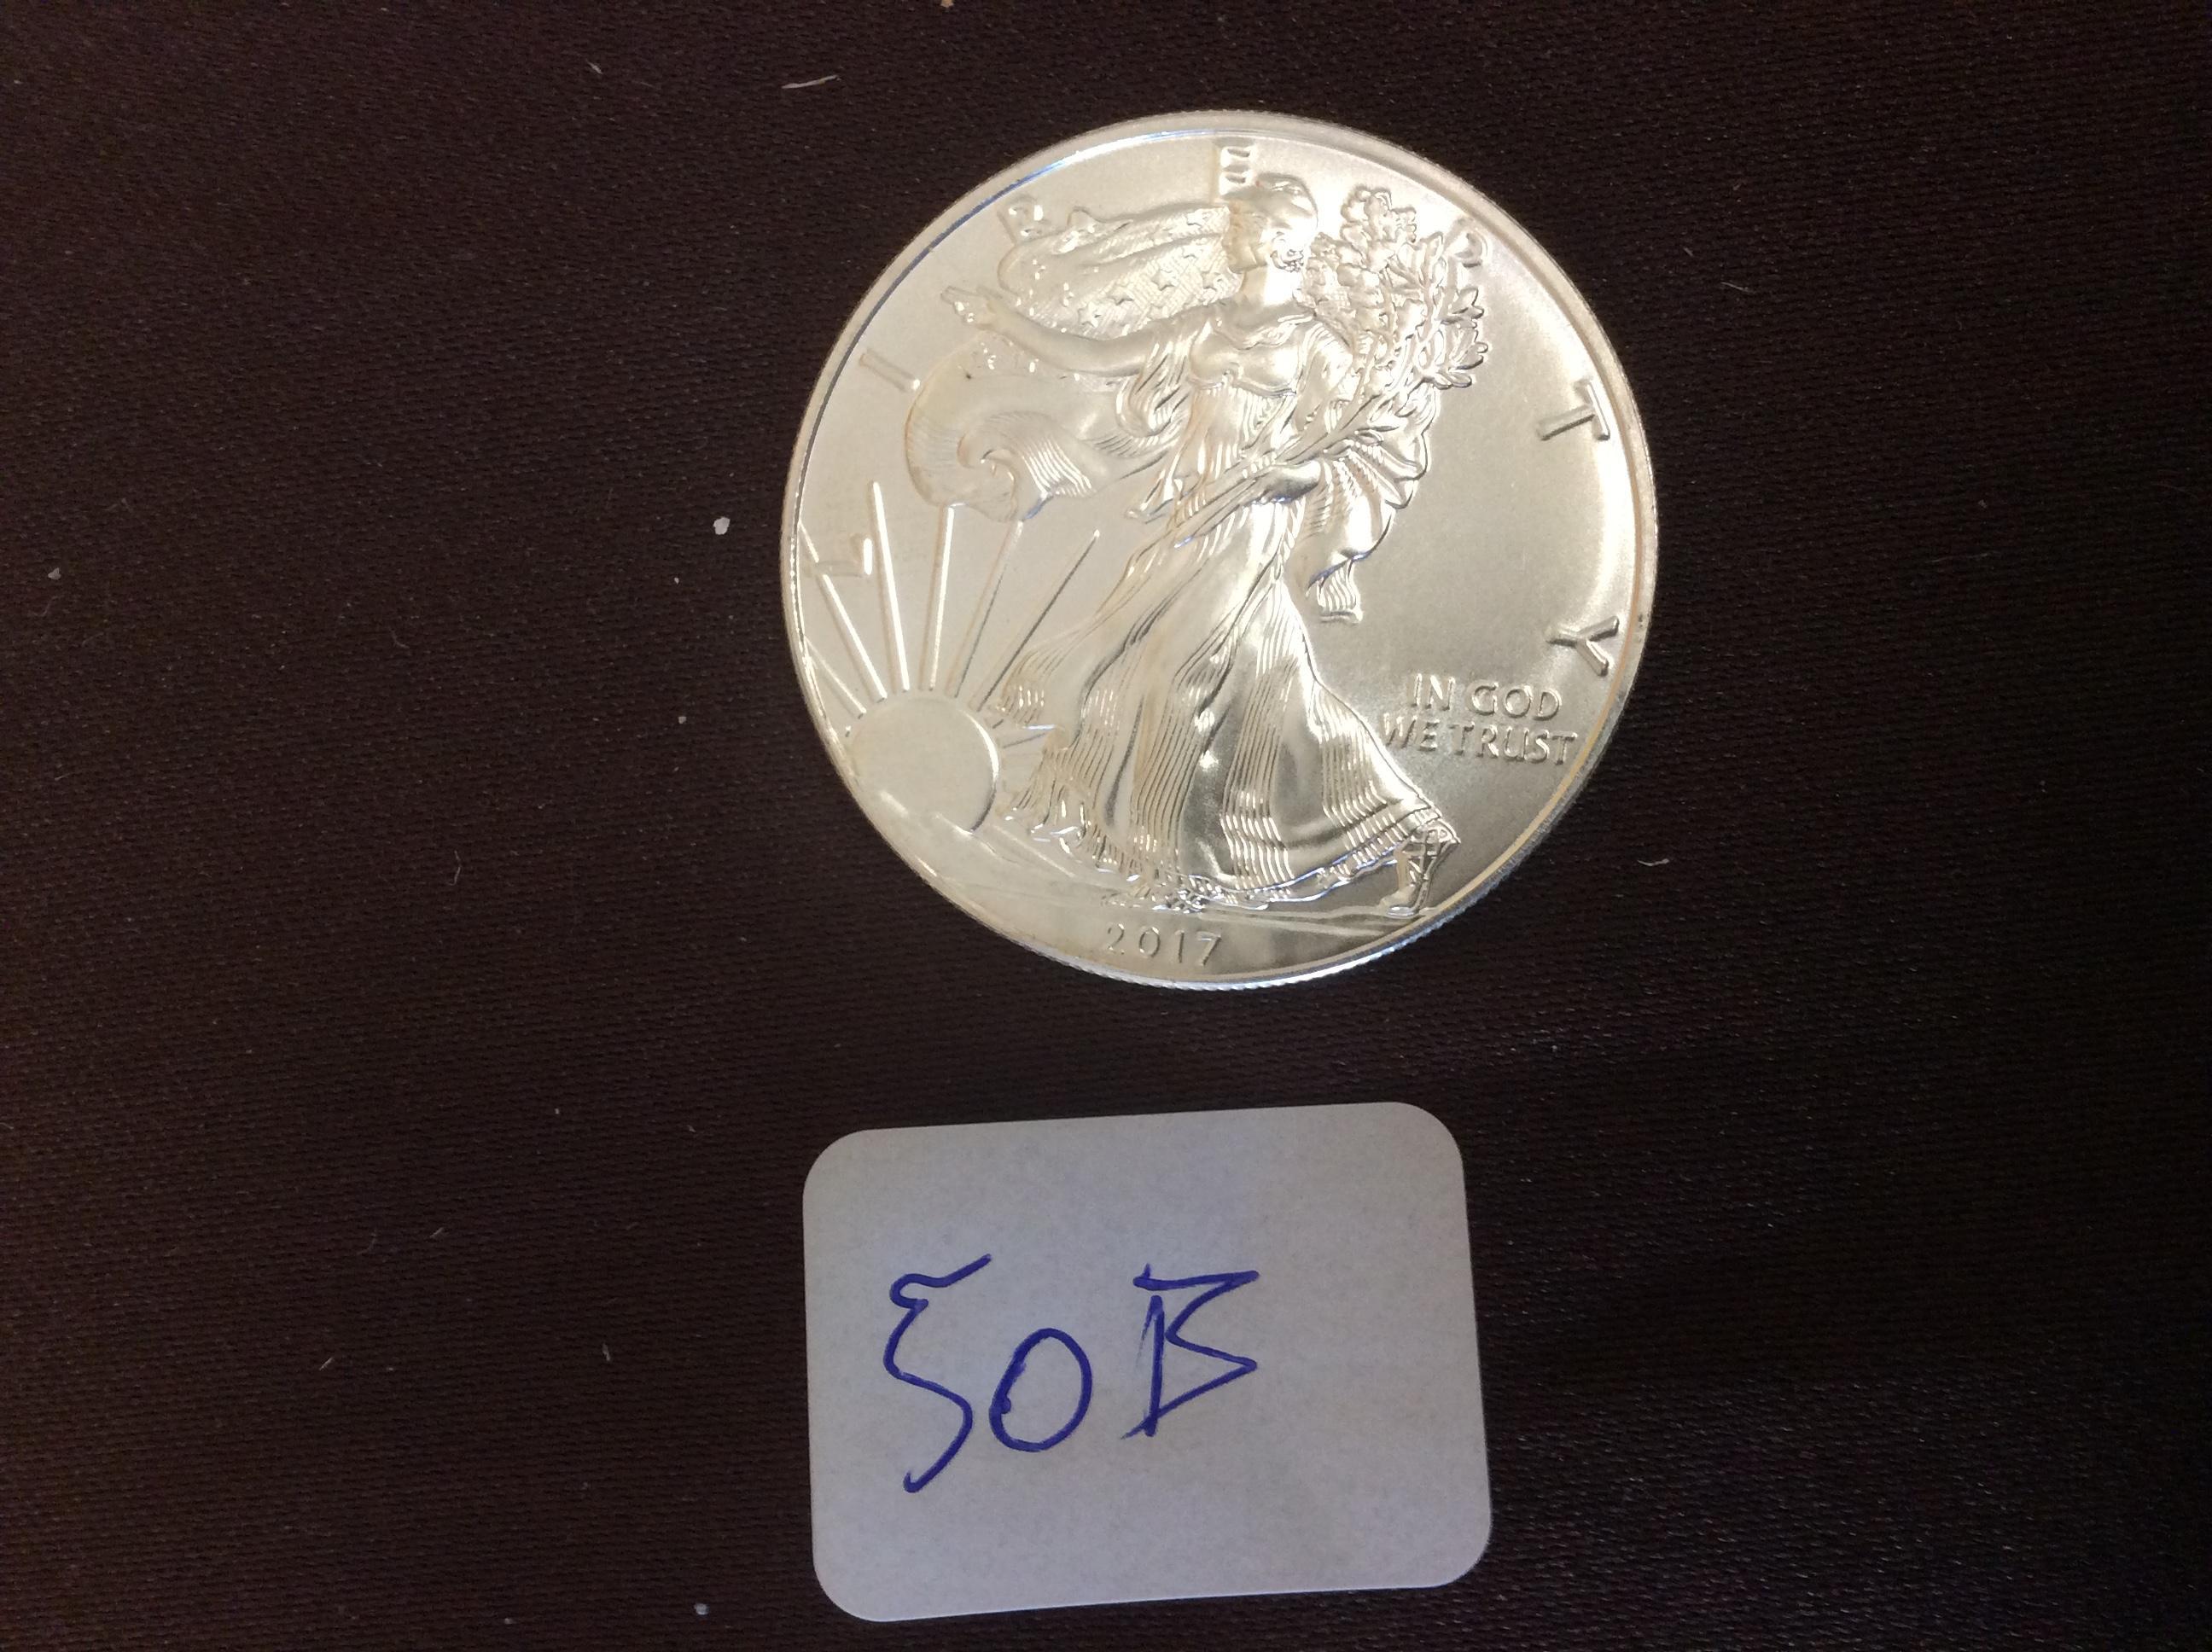 1 oz fine silver one dollar coin